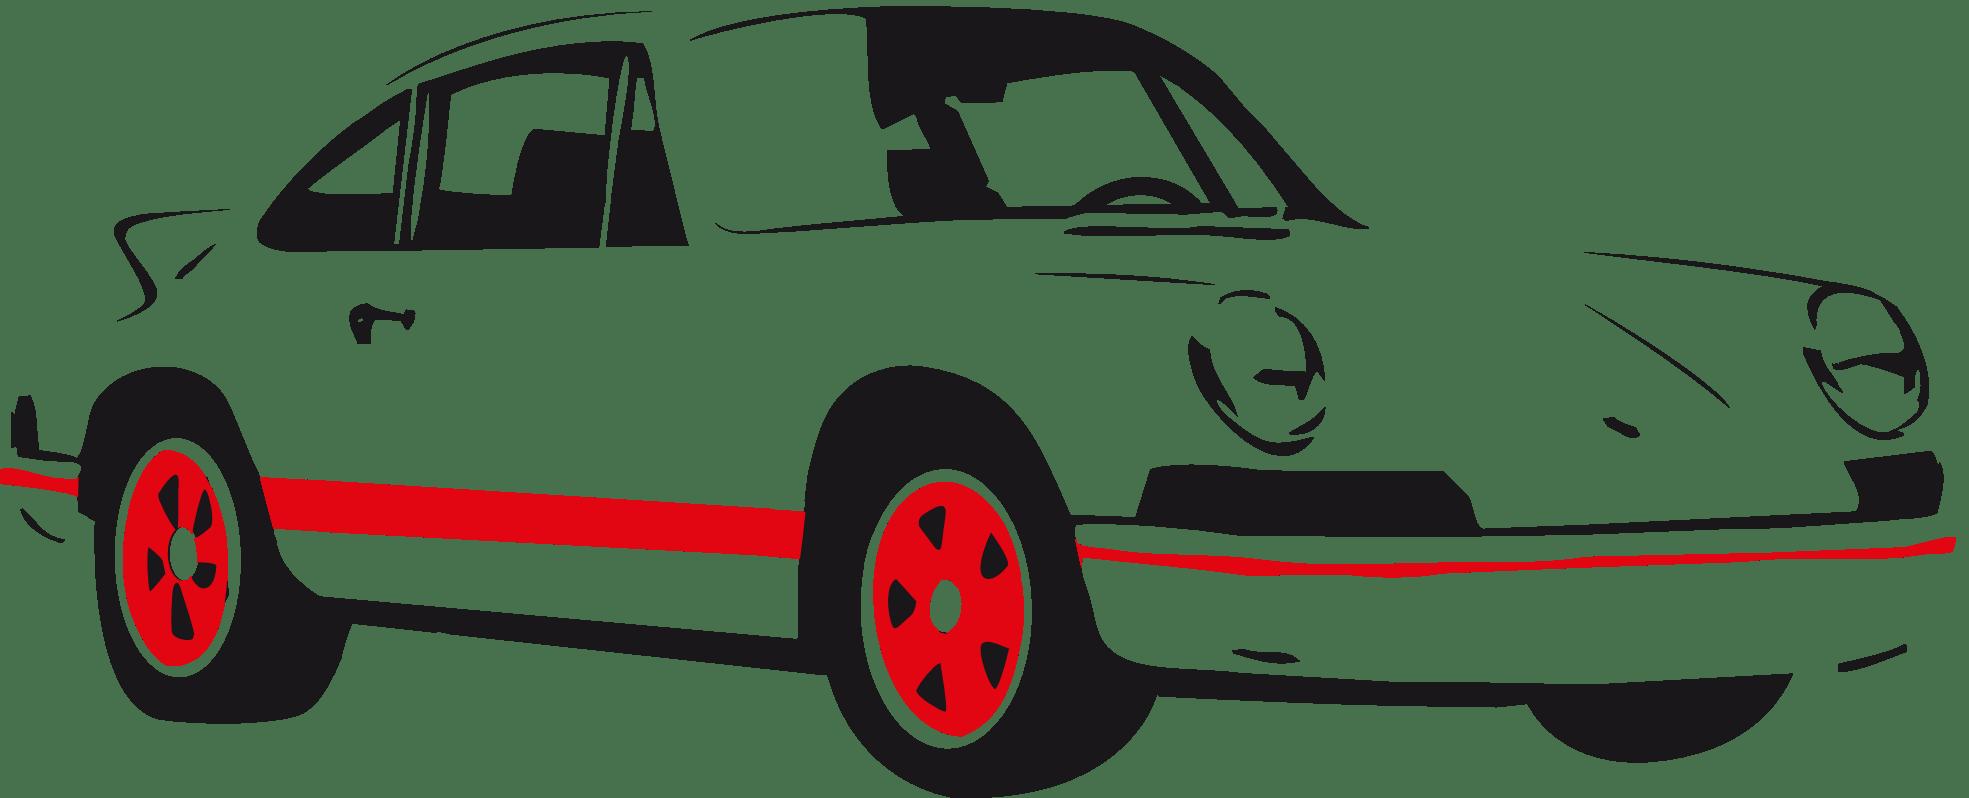 vehicle diagram clip art dual humbucker split coil wiring car black and white cliparts co